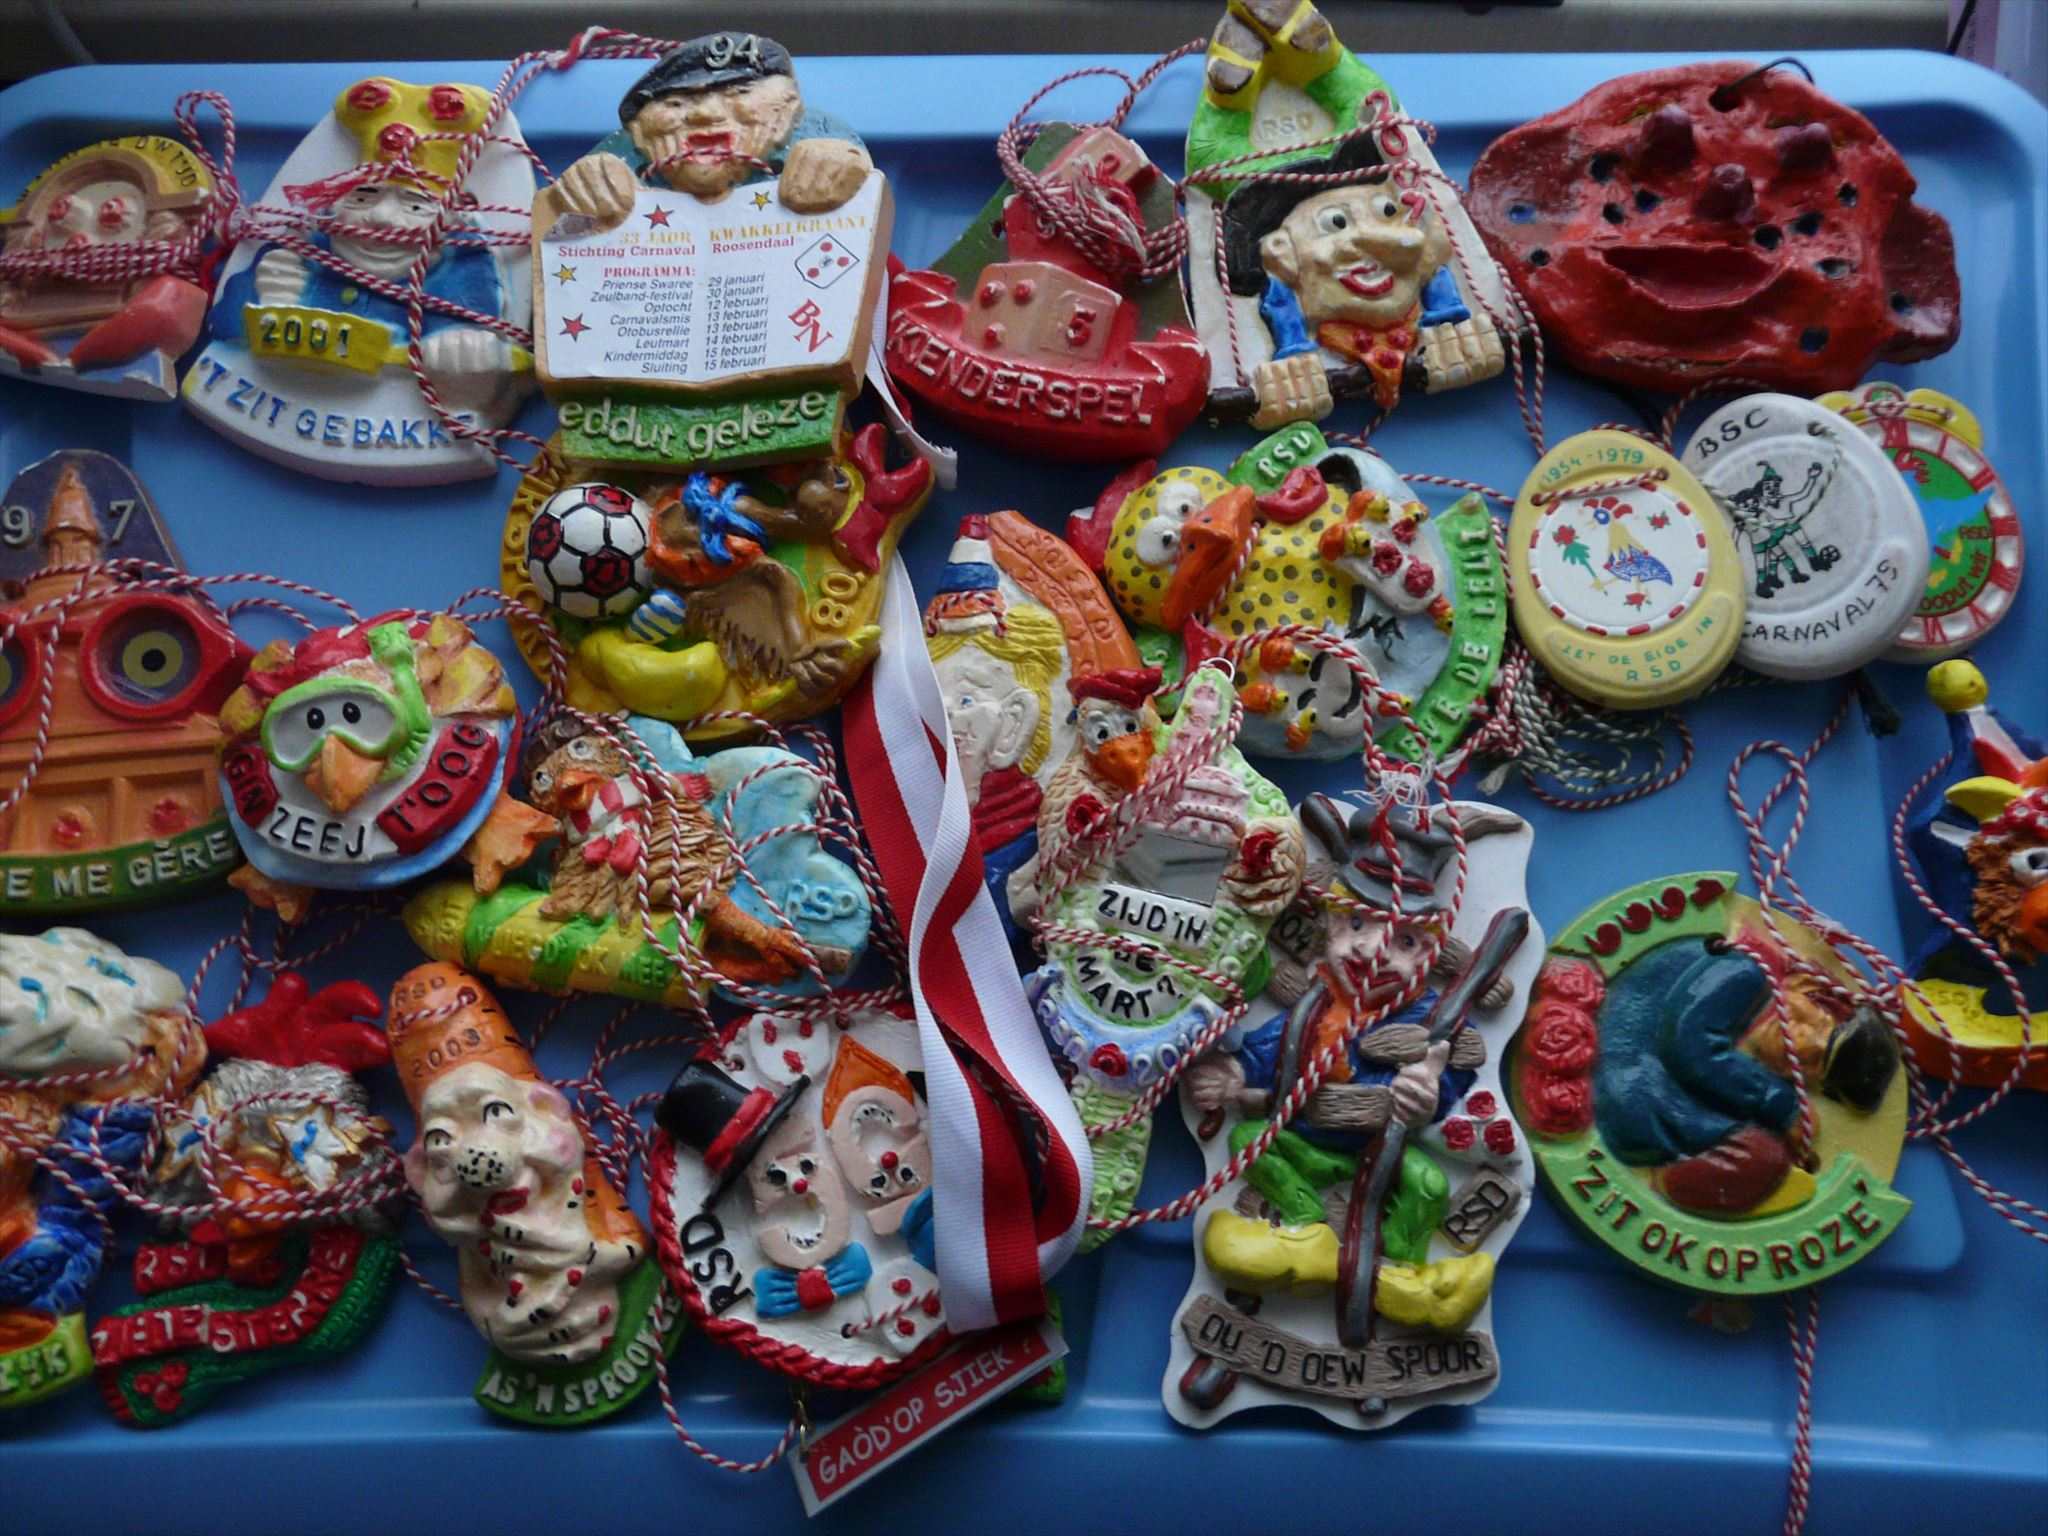 ontwerp veldteken da s m n stadje stichting carnaval